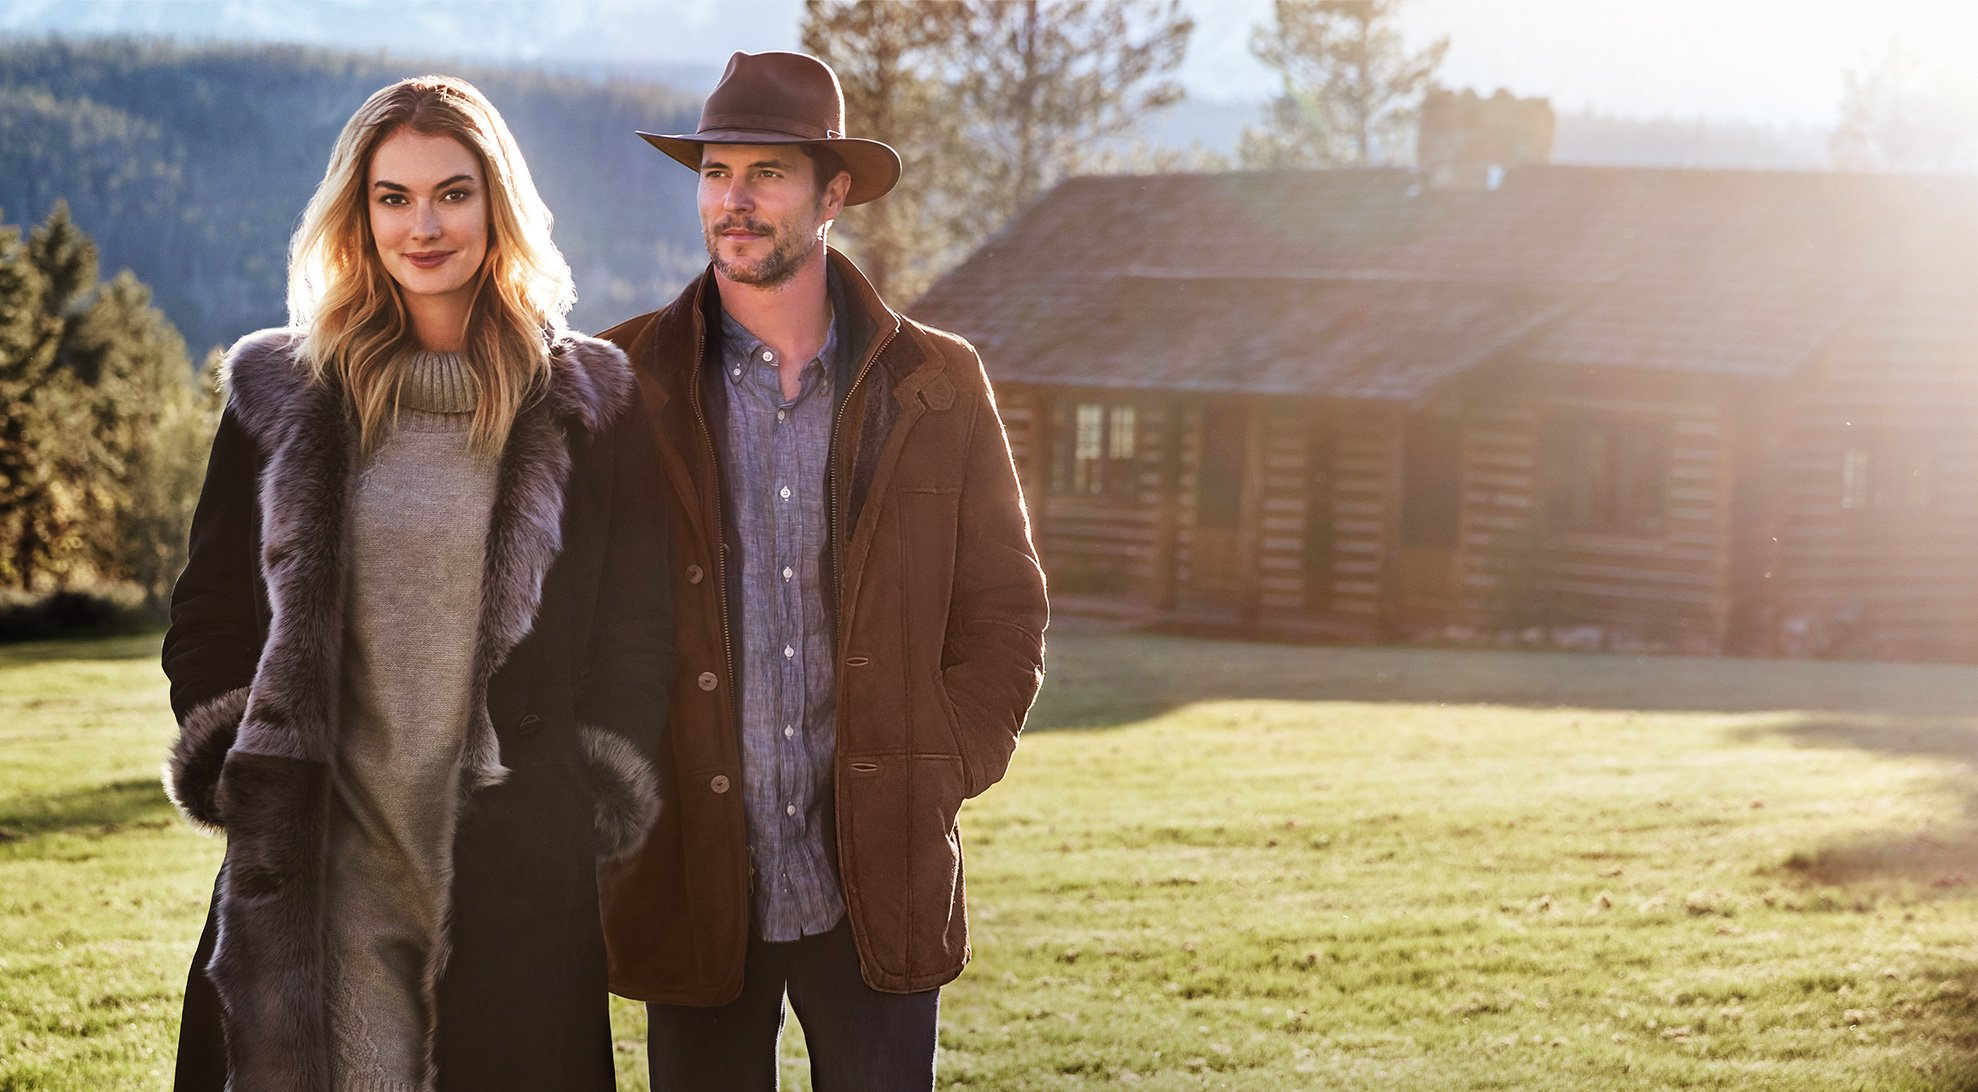 Man and Woman in Sheepskin Coats